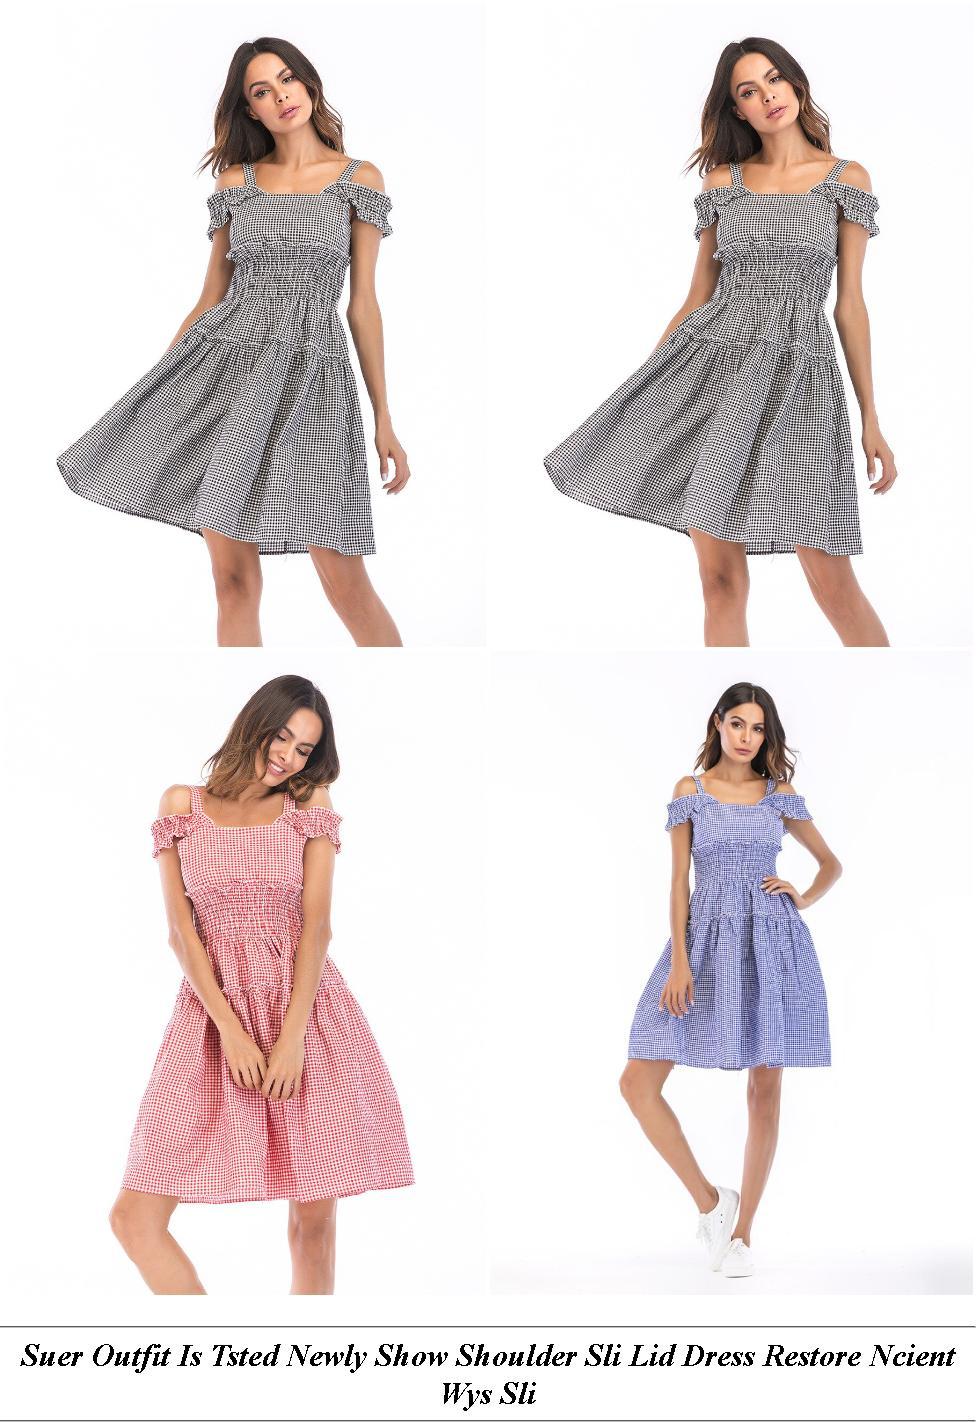 Velvet Dresses - Salesforce Shop System - Lace Dress And Sneakers